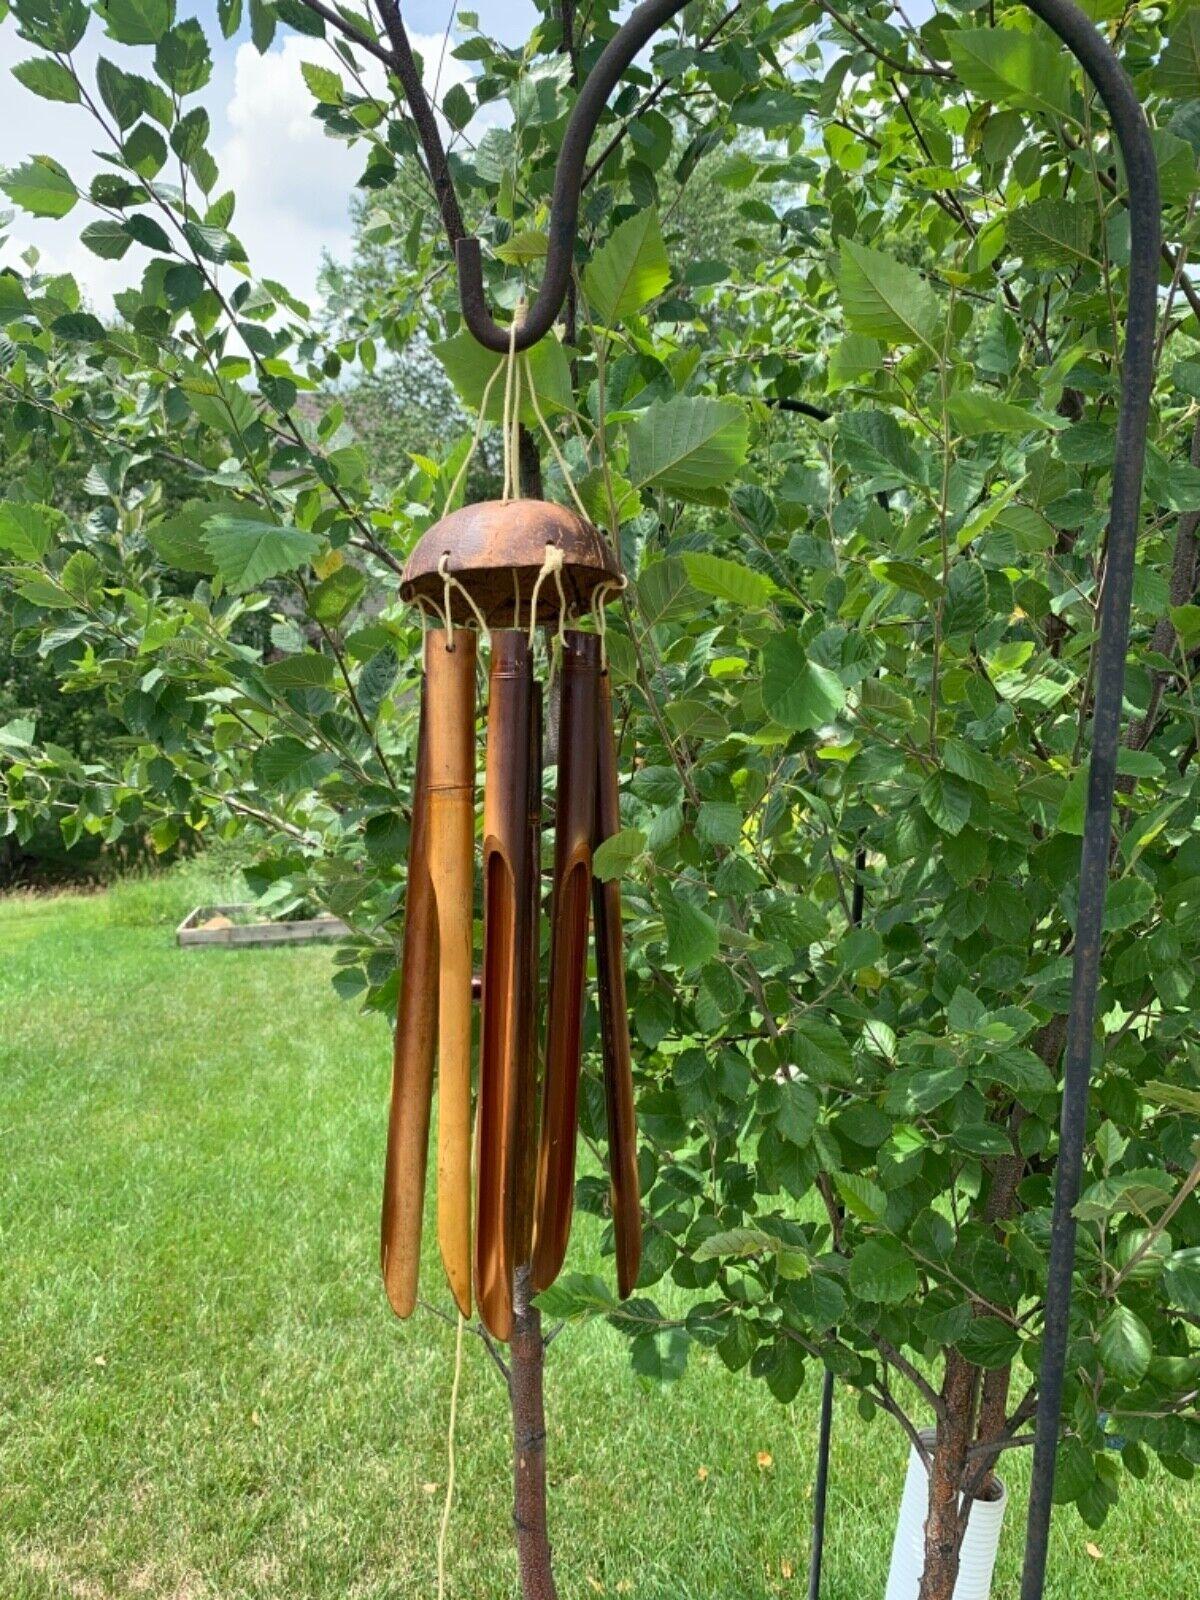 Handmade Bamboo Wind Chimes Outdoors & Indoors, Deep tunes - 6 Bamboo Tube